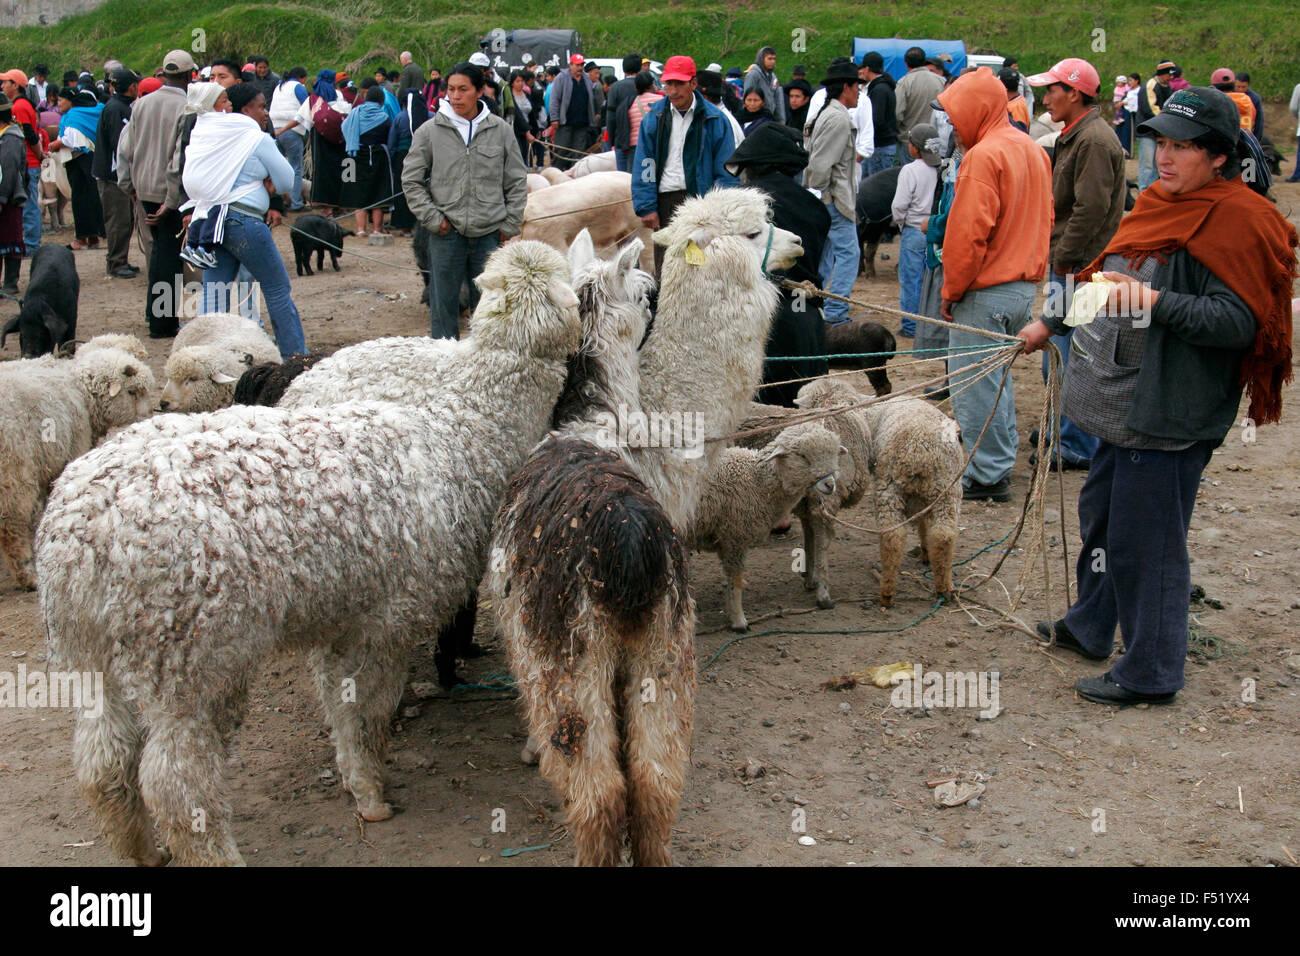 Llamas on sale at Otavalo market, Ecuador, South America - Stock Image